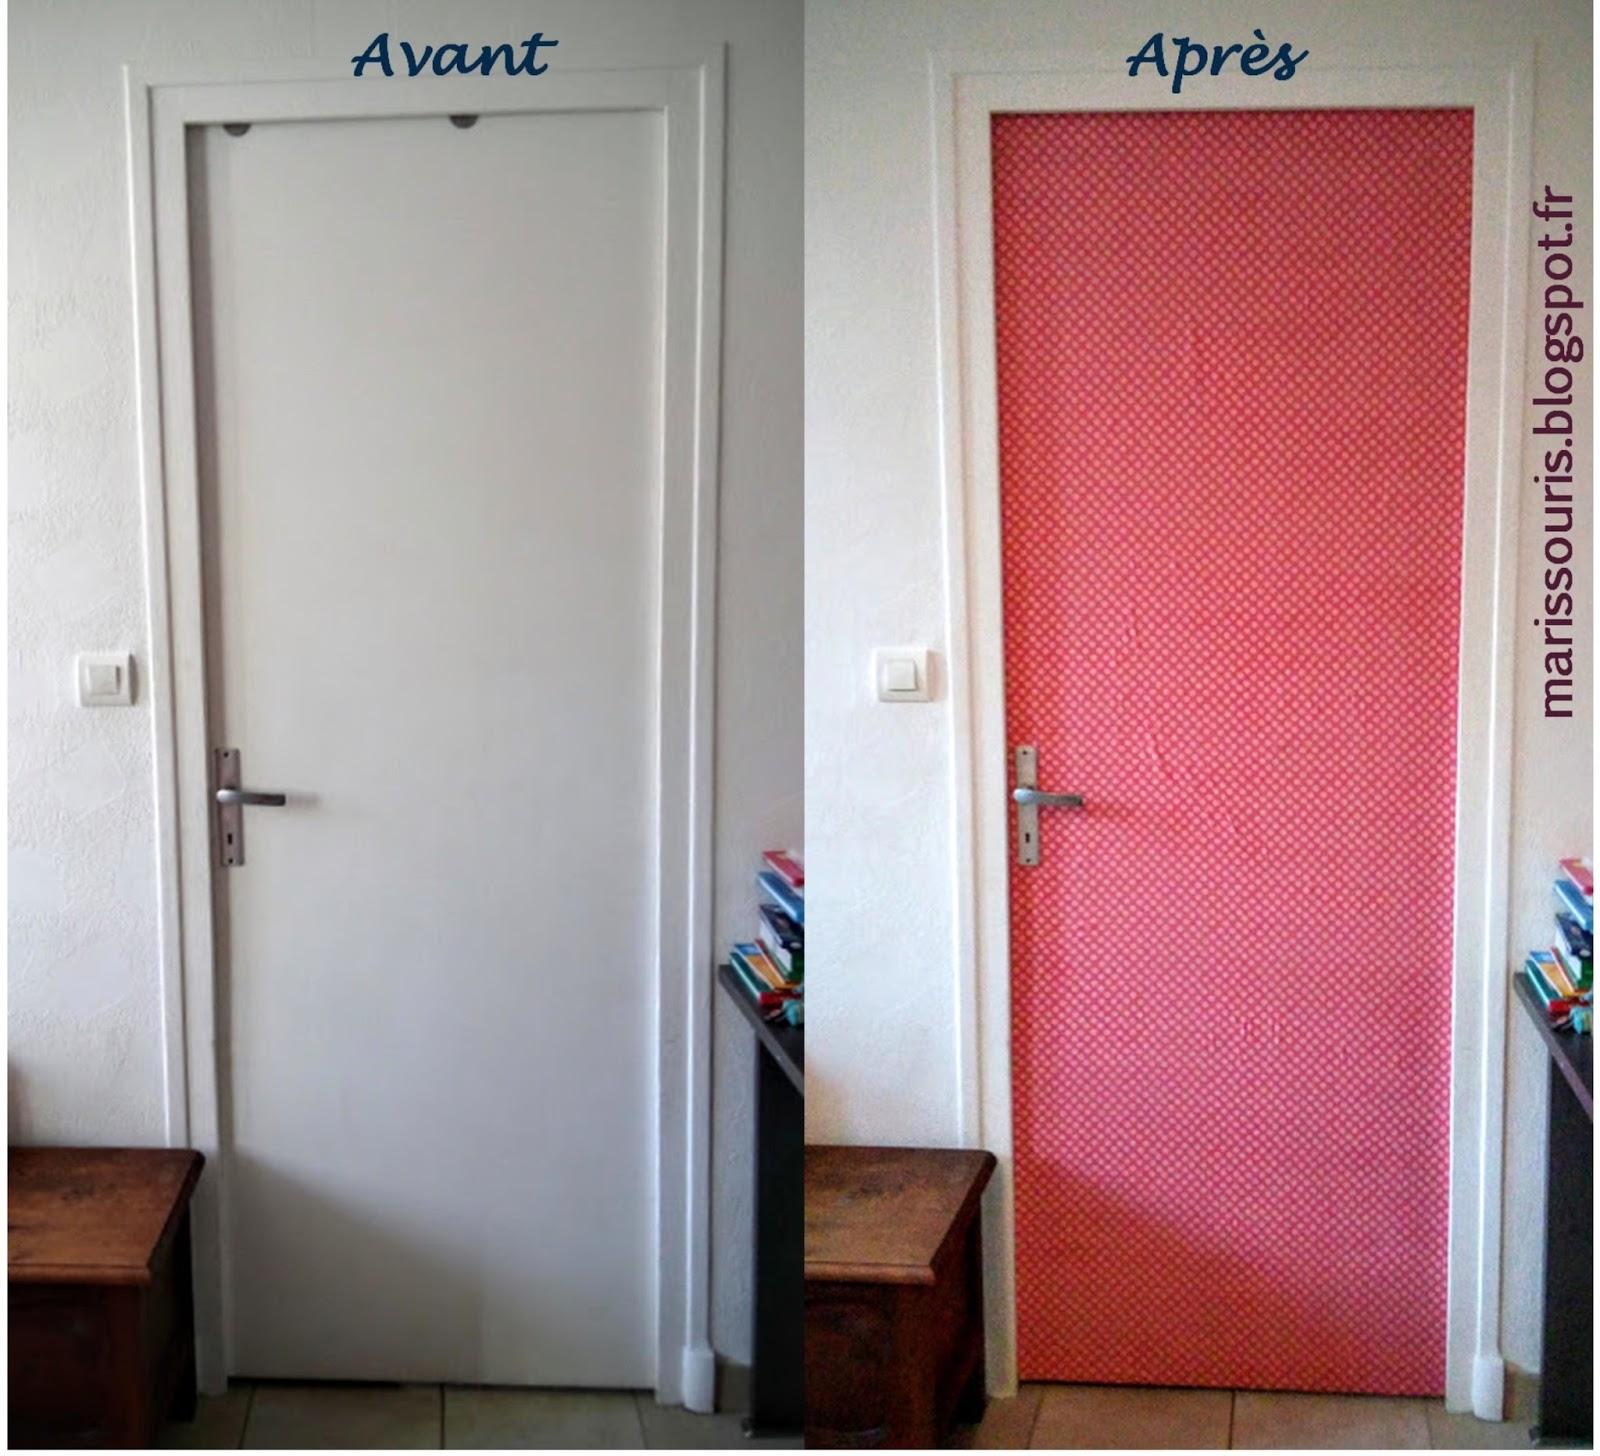 marissouris coller un tissu au mur avec de la ma zena. Black Bedroom Furniture Sets. Home Design Ideas